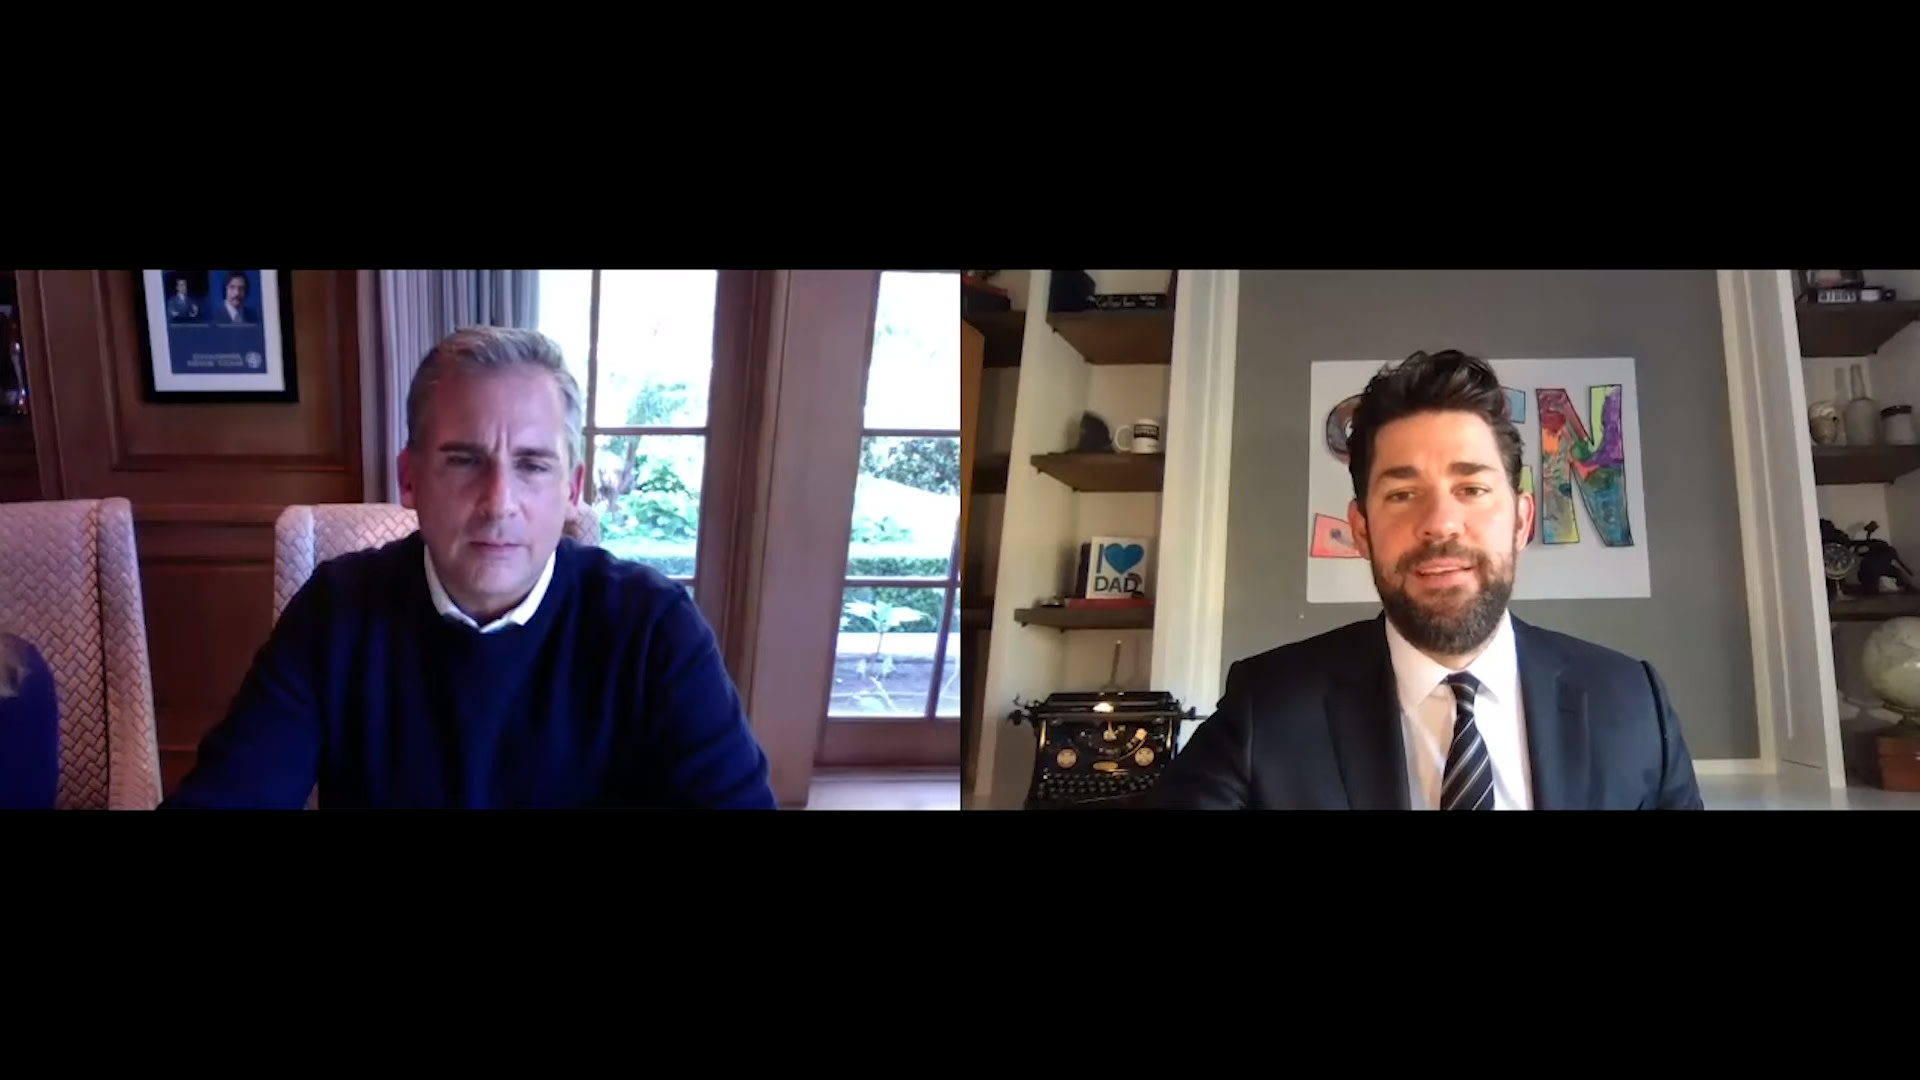 John Krasinski Shares 'Some Good News' YouTube Show With Special Guest Steve Carell